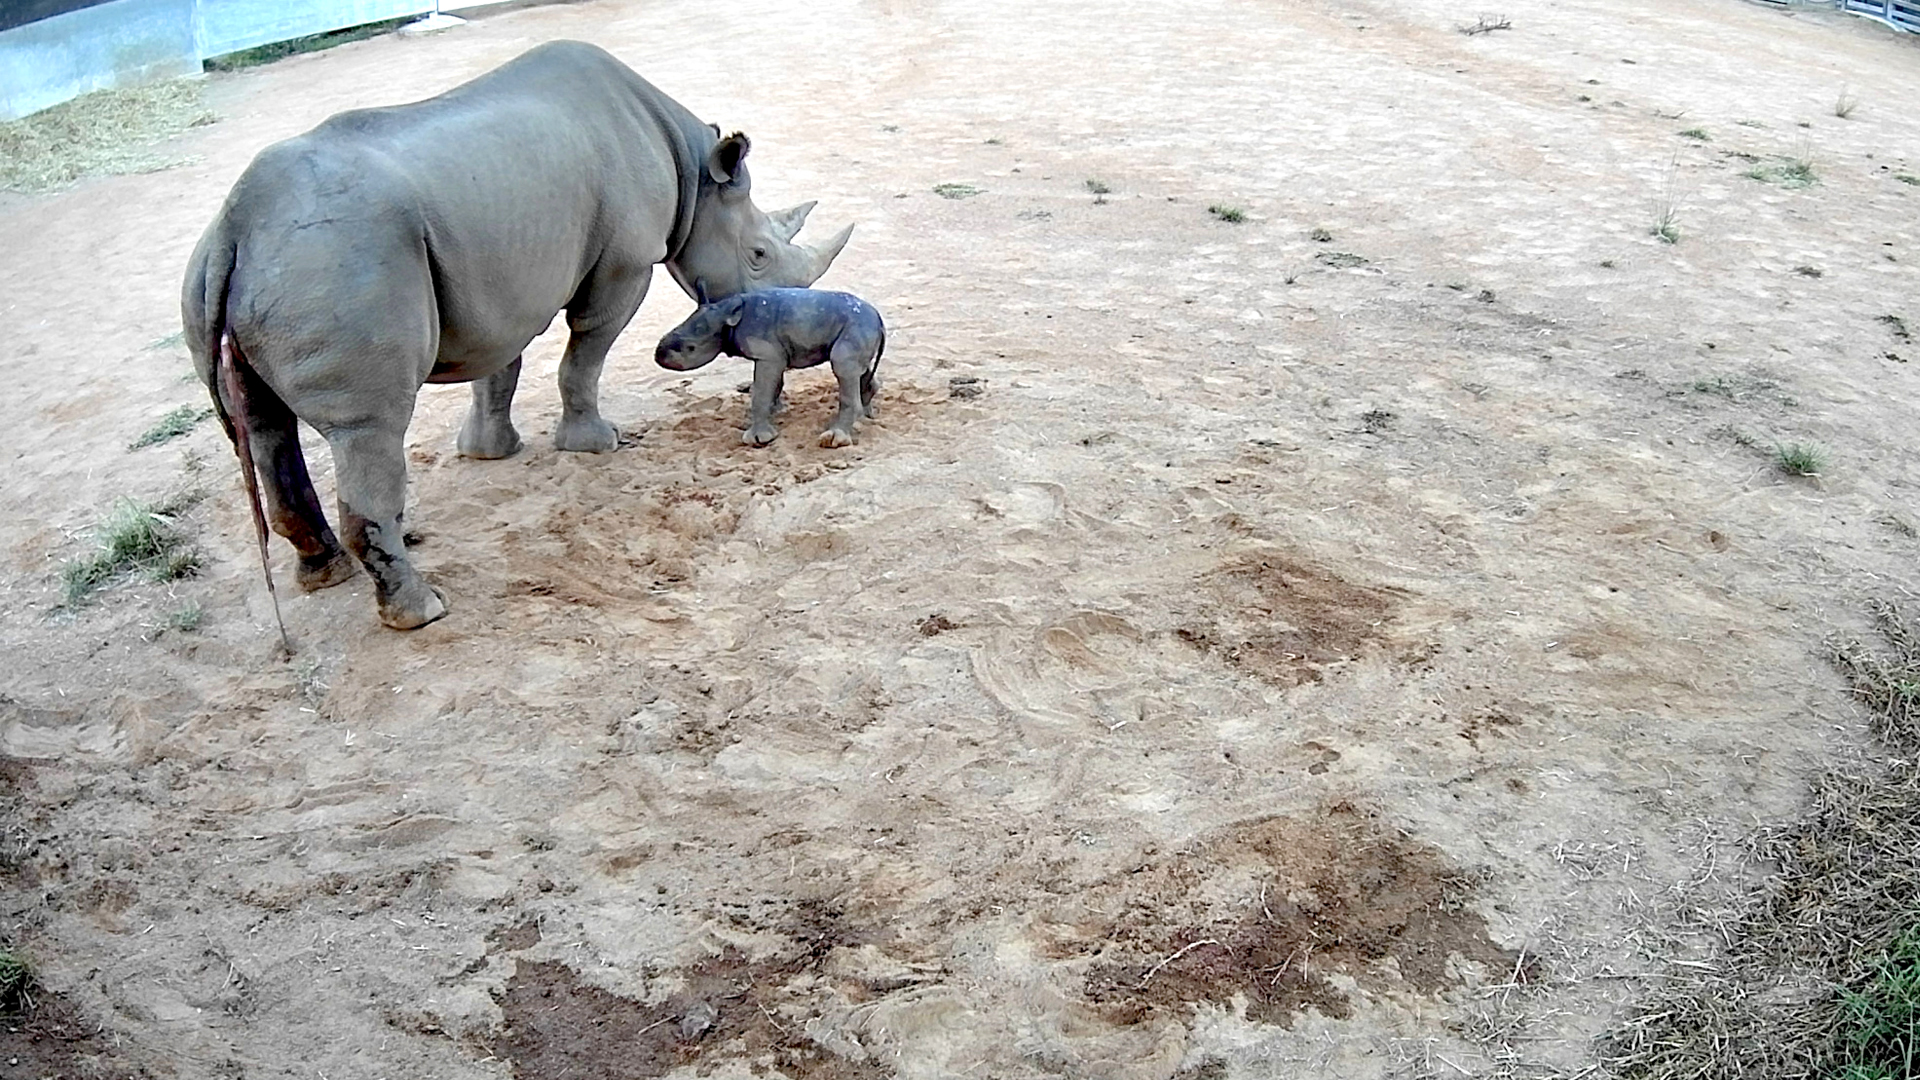 VIDEO: Rhino Kneels: Rare Baby Black Rhino Stumbles On Her First Shaky Steps